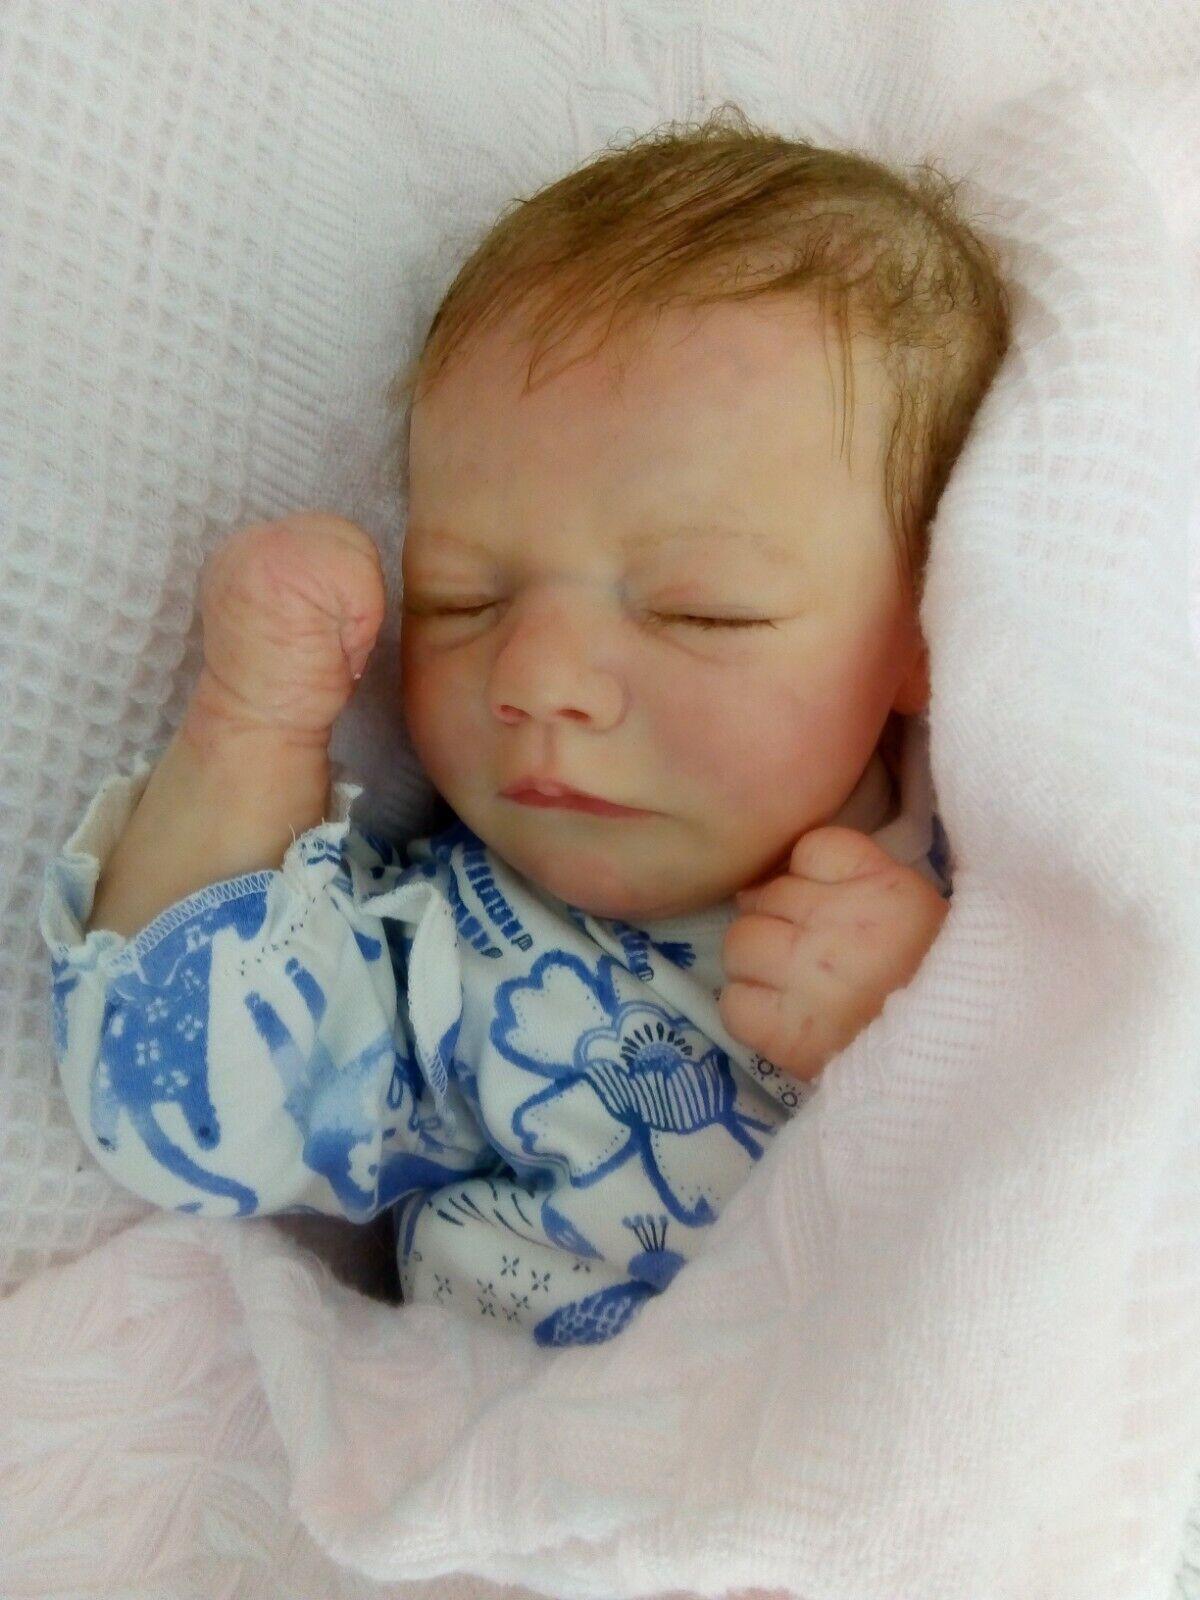 Realborn Bountifu baby Brooklyn reborn doll by Perrywinkles UK Artist with C.O.A